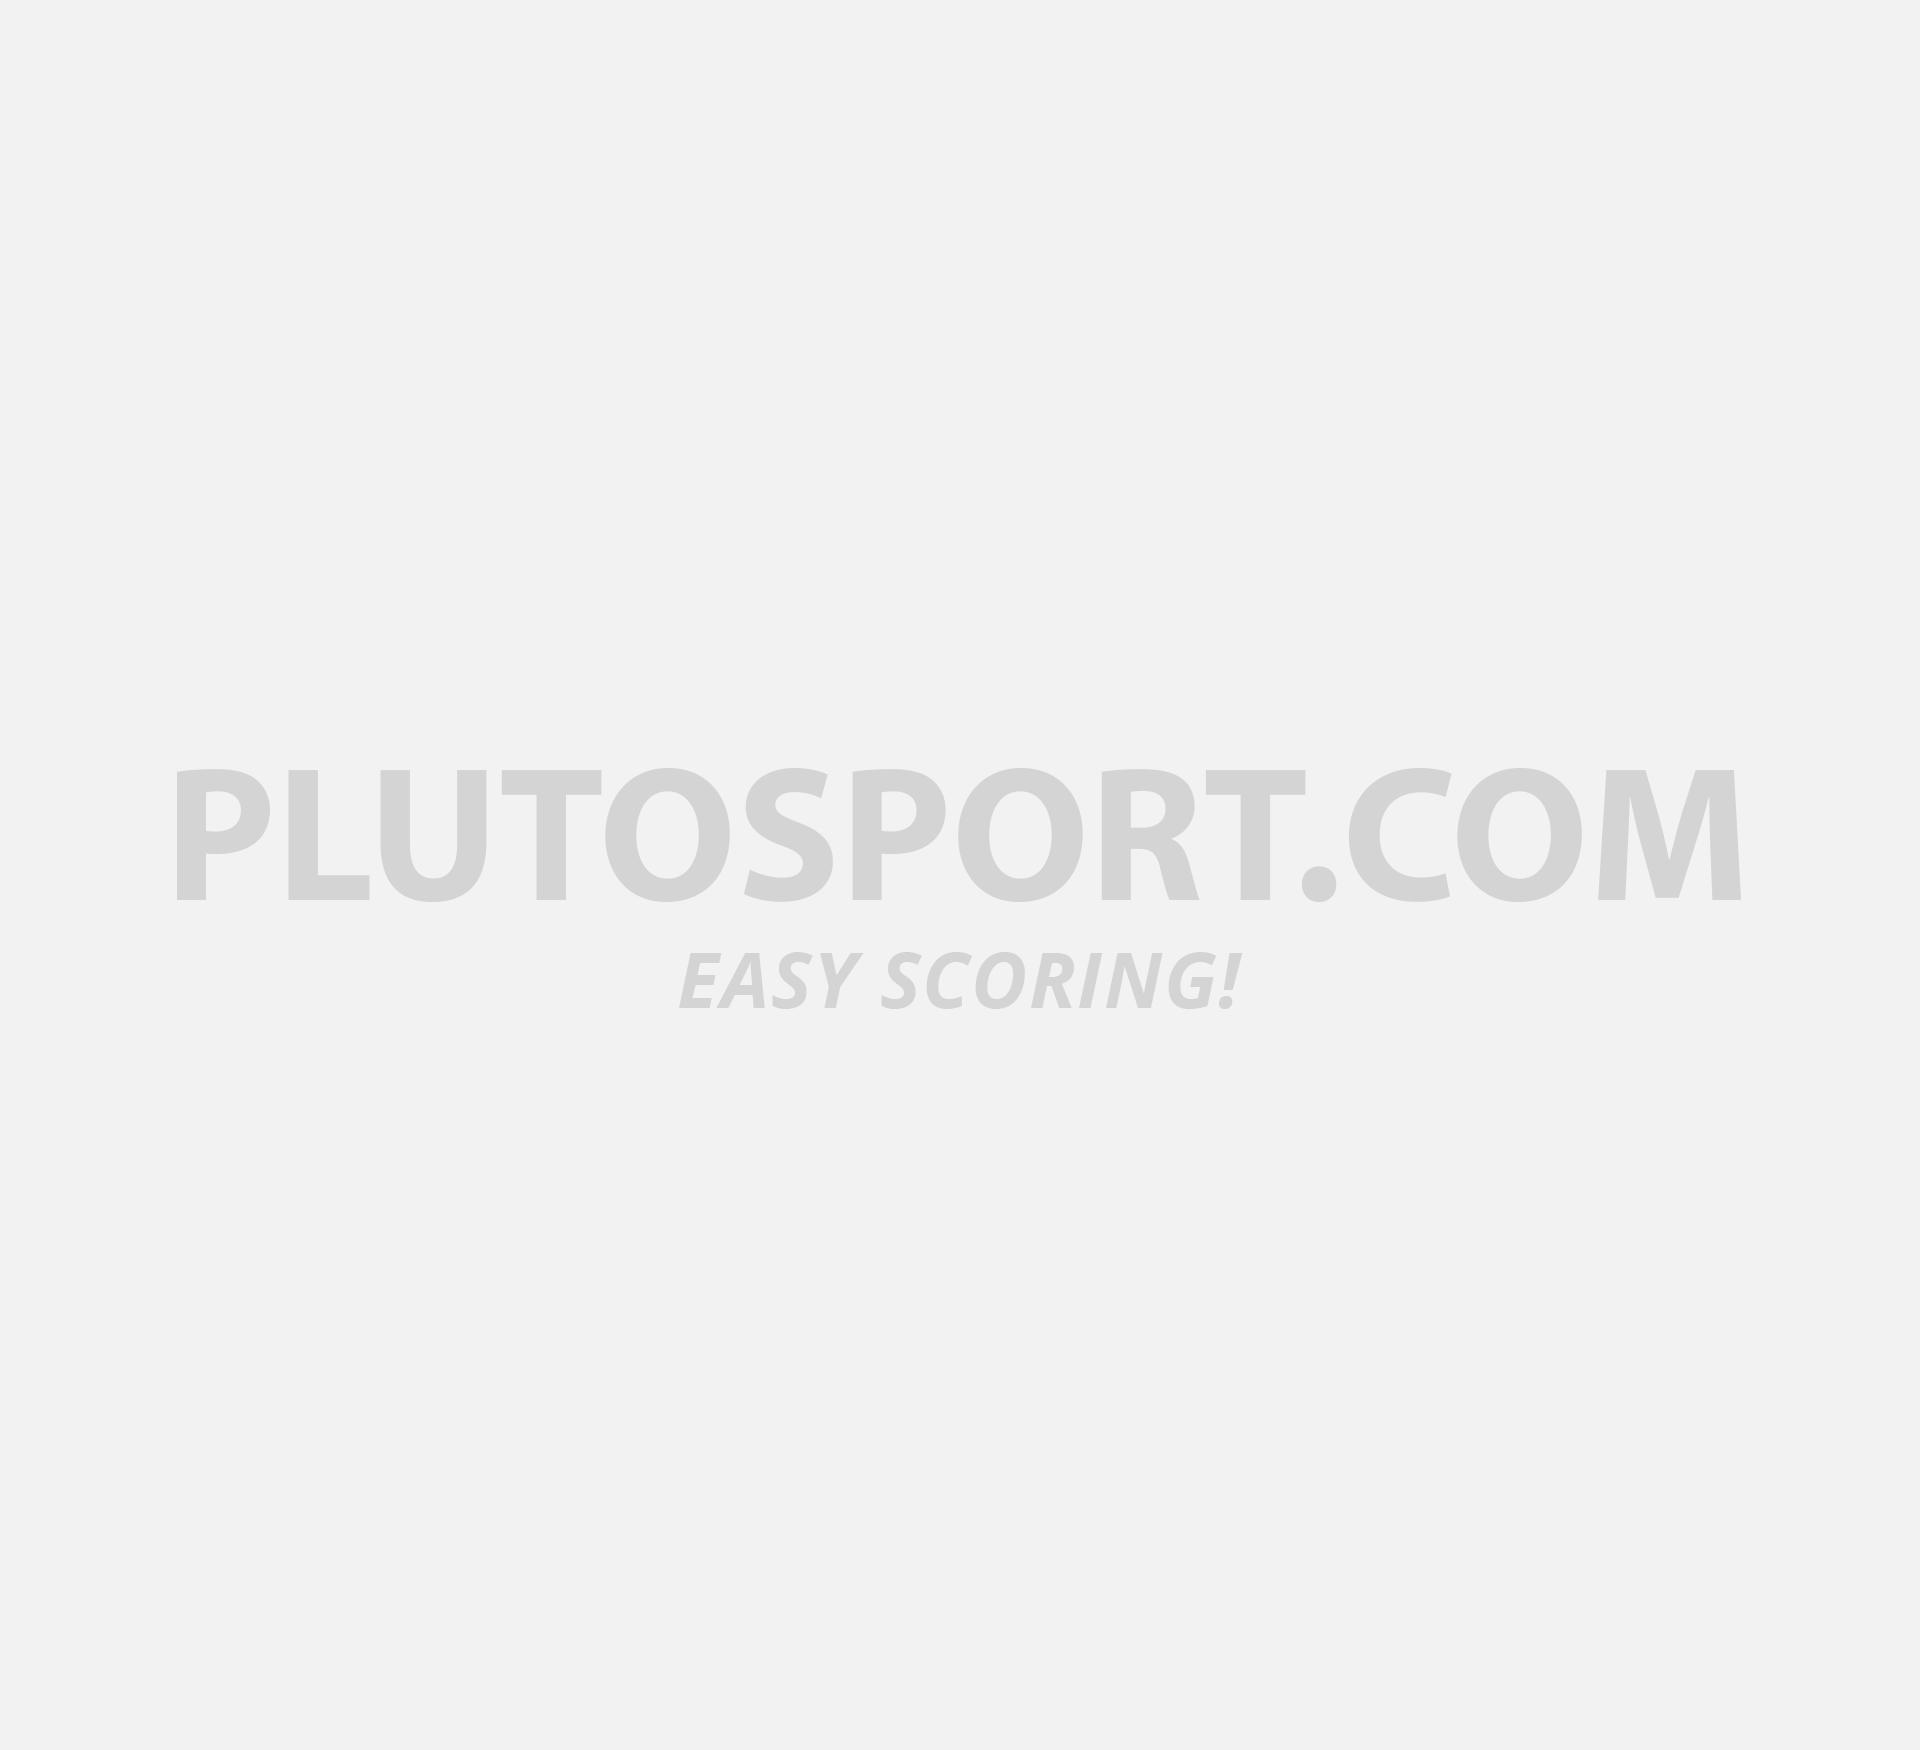 8e9f4005 Helly Hansen W Crew Insulator Jacket - Downjackets - Jackets - Clothing -  Lifestyle - Women | Plutosport